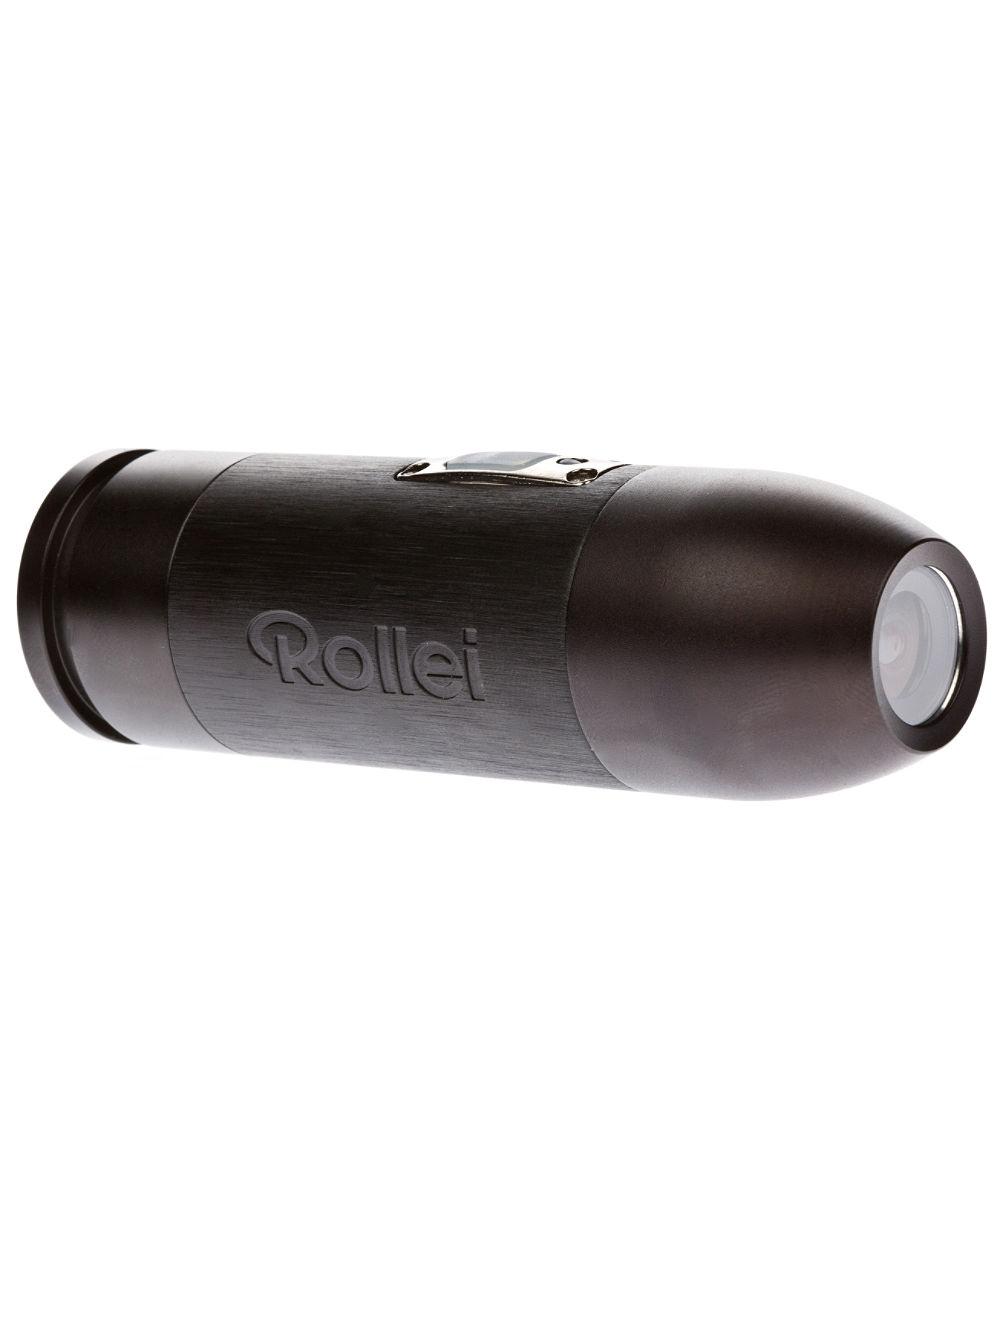 Rollei Rollei Bullet HD Pro 1080p Ski Edition - rollei - blue-tomato.com